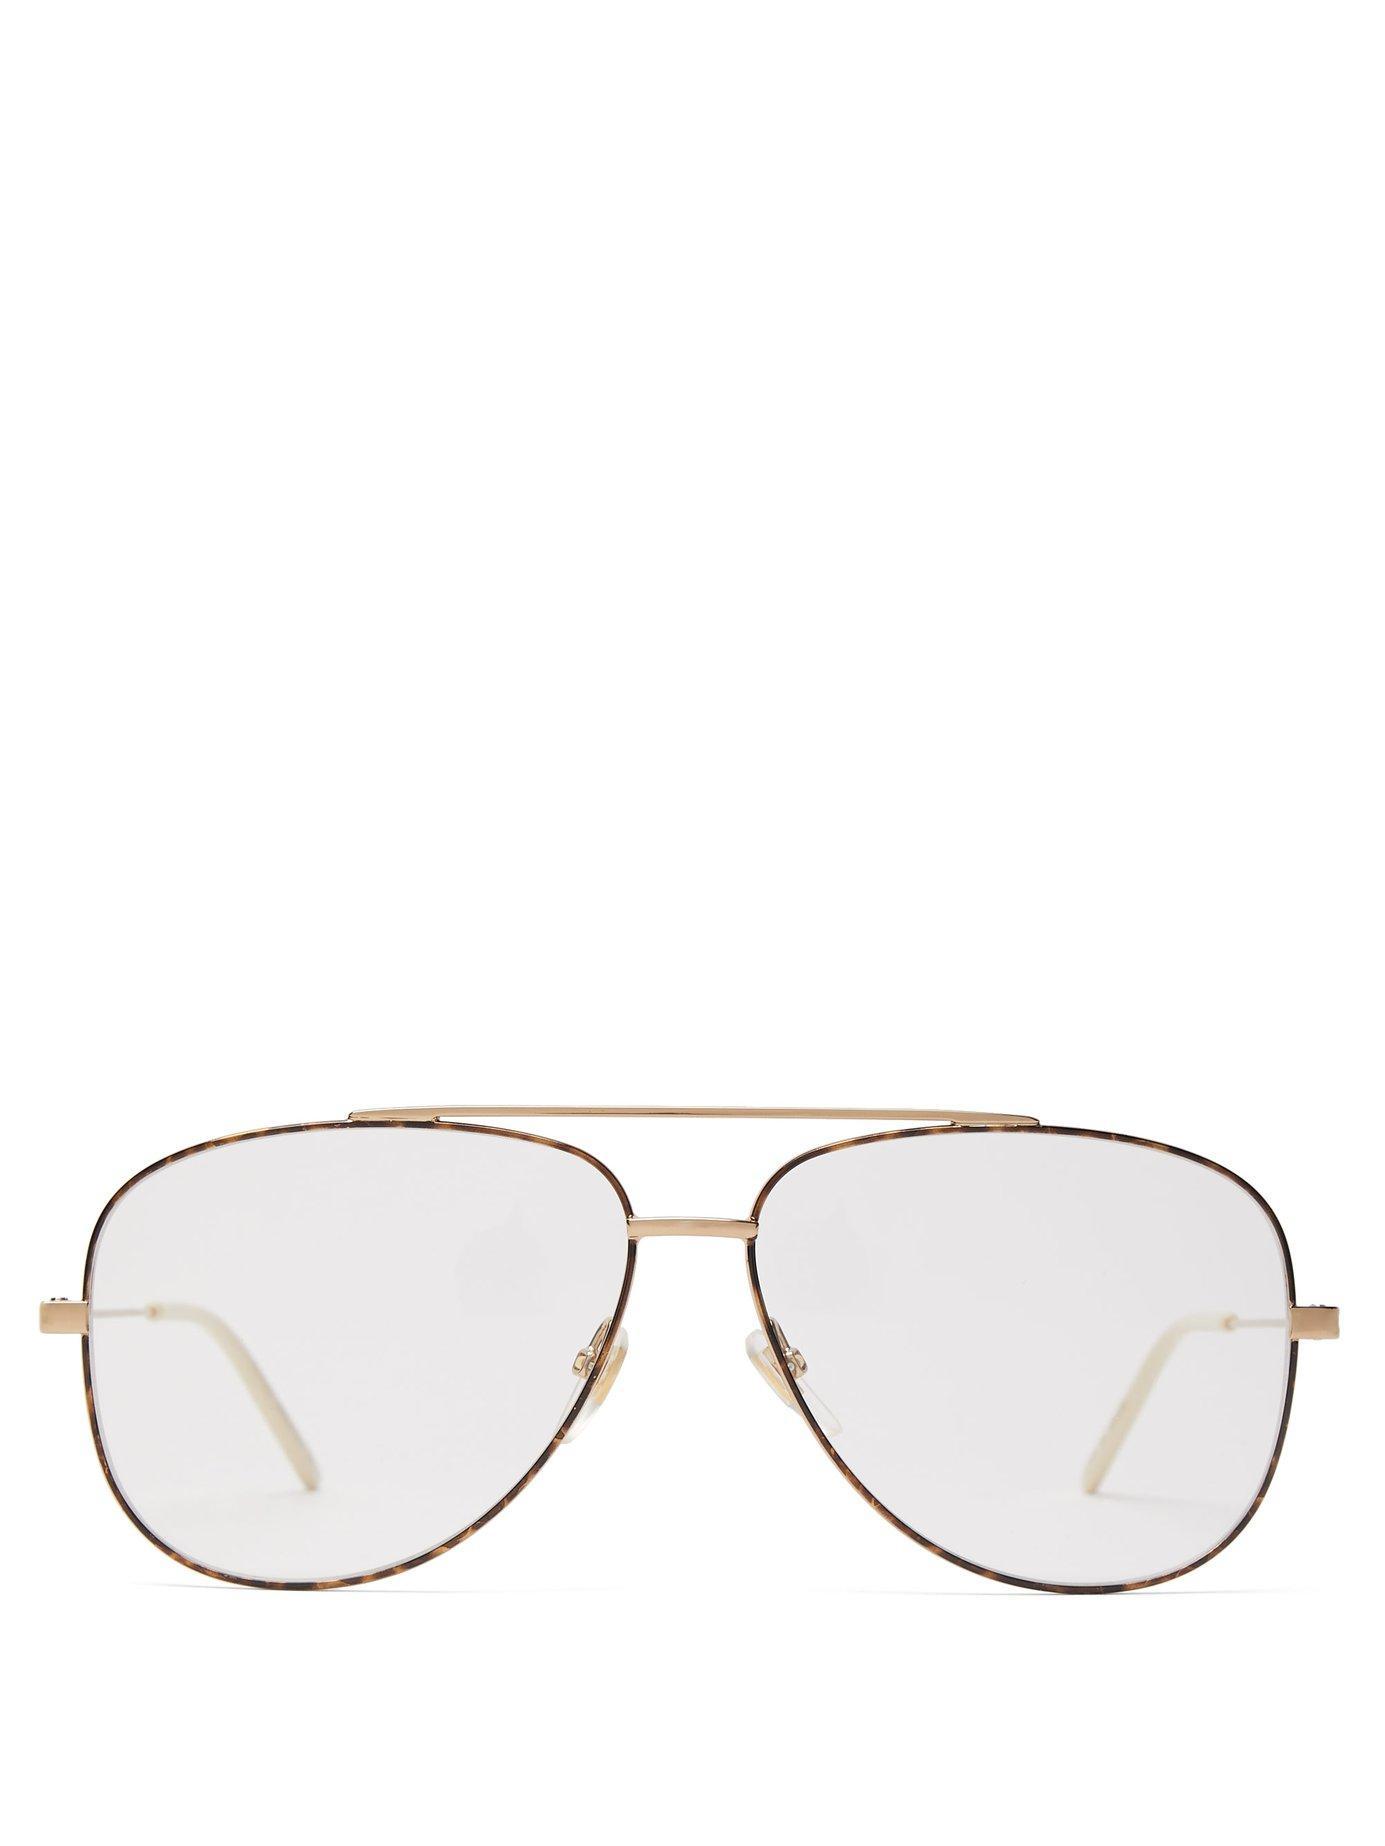 72516d1ae12c2 Lyst - Gucci Tortoiseshell Effect Aviator Frame Glasses in Metallic ...